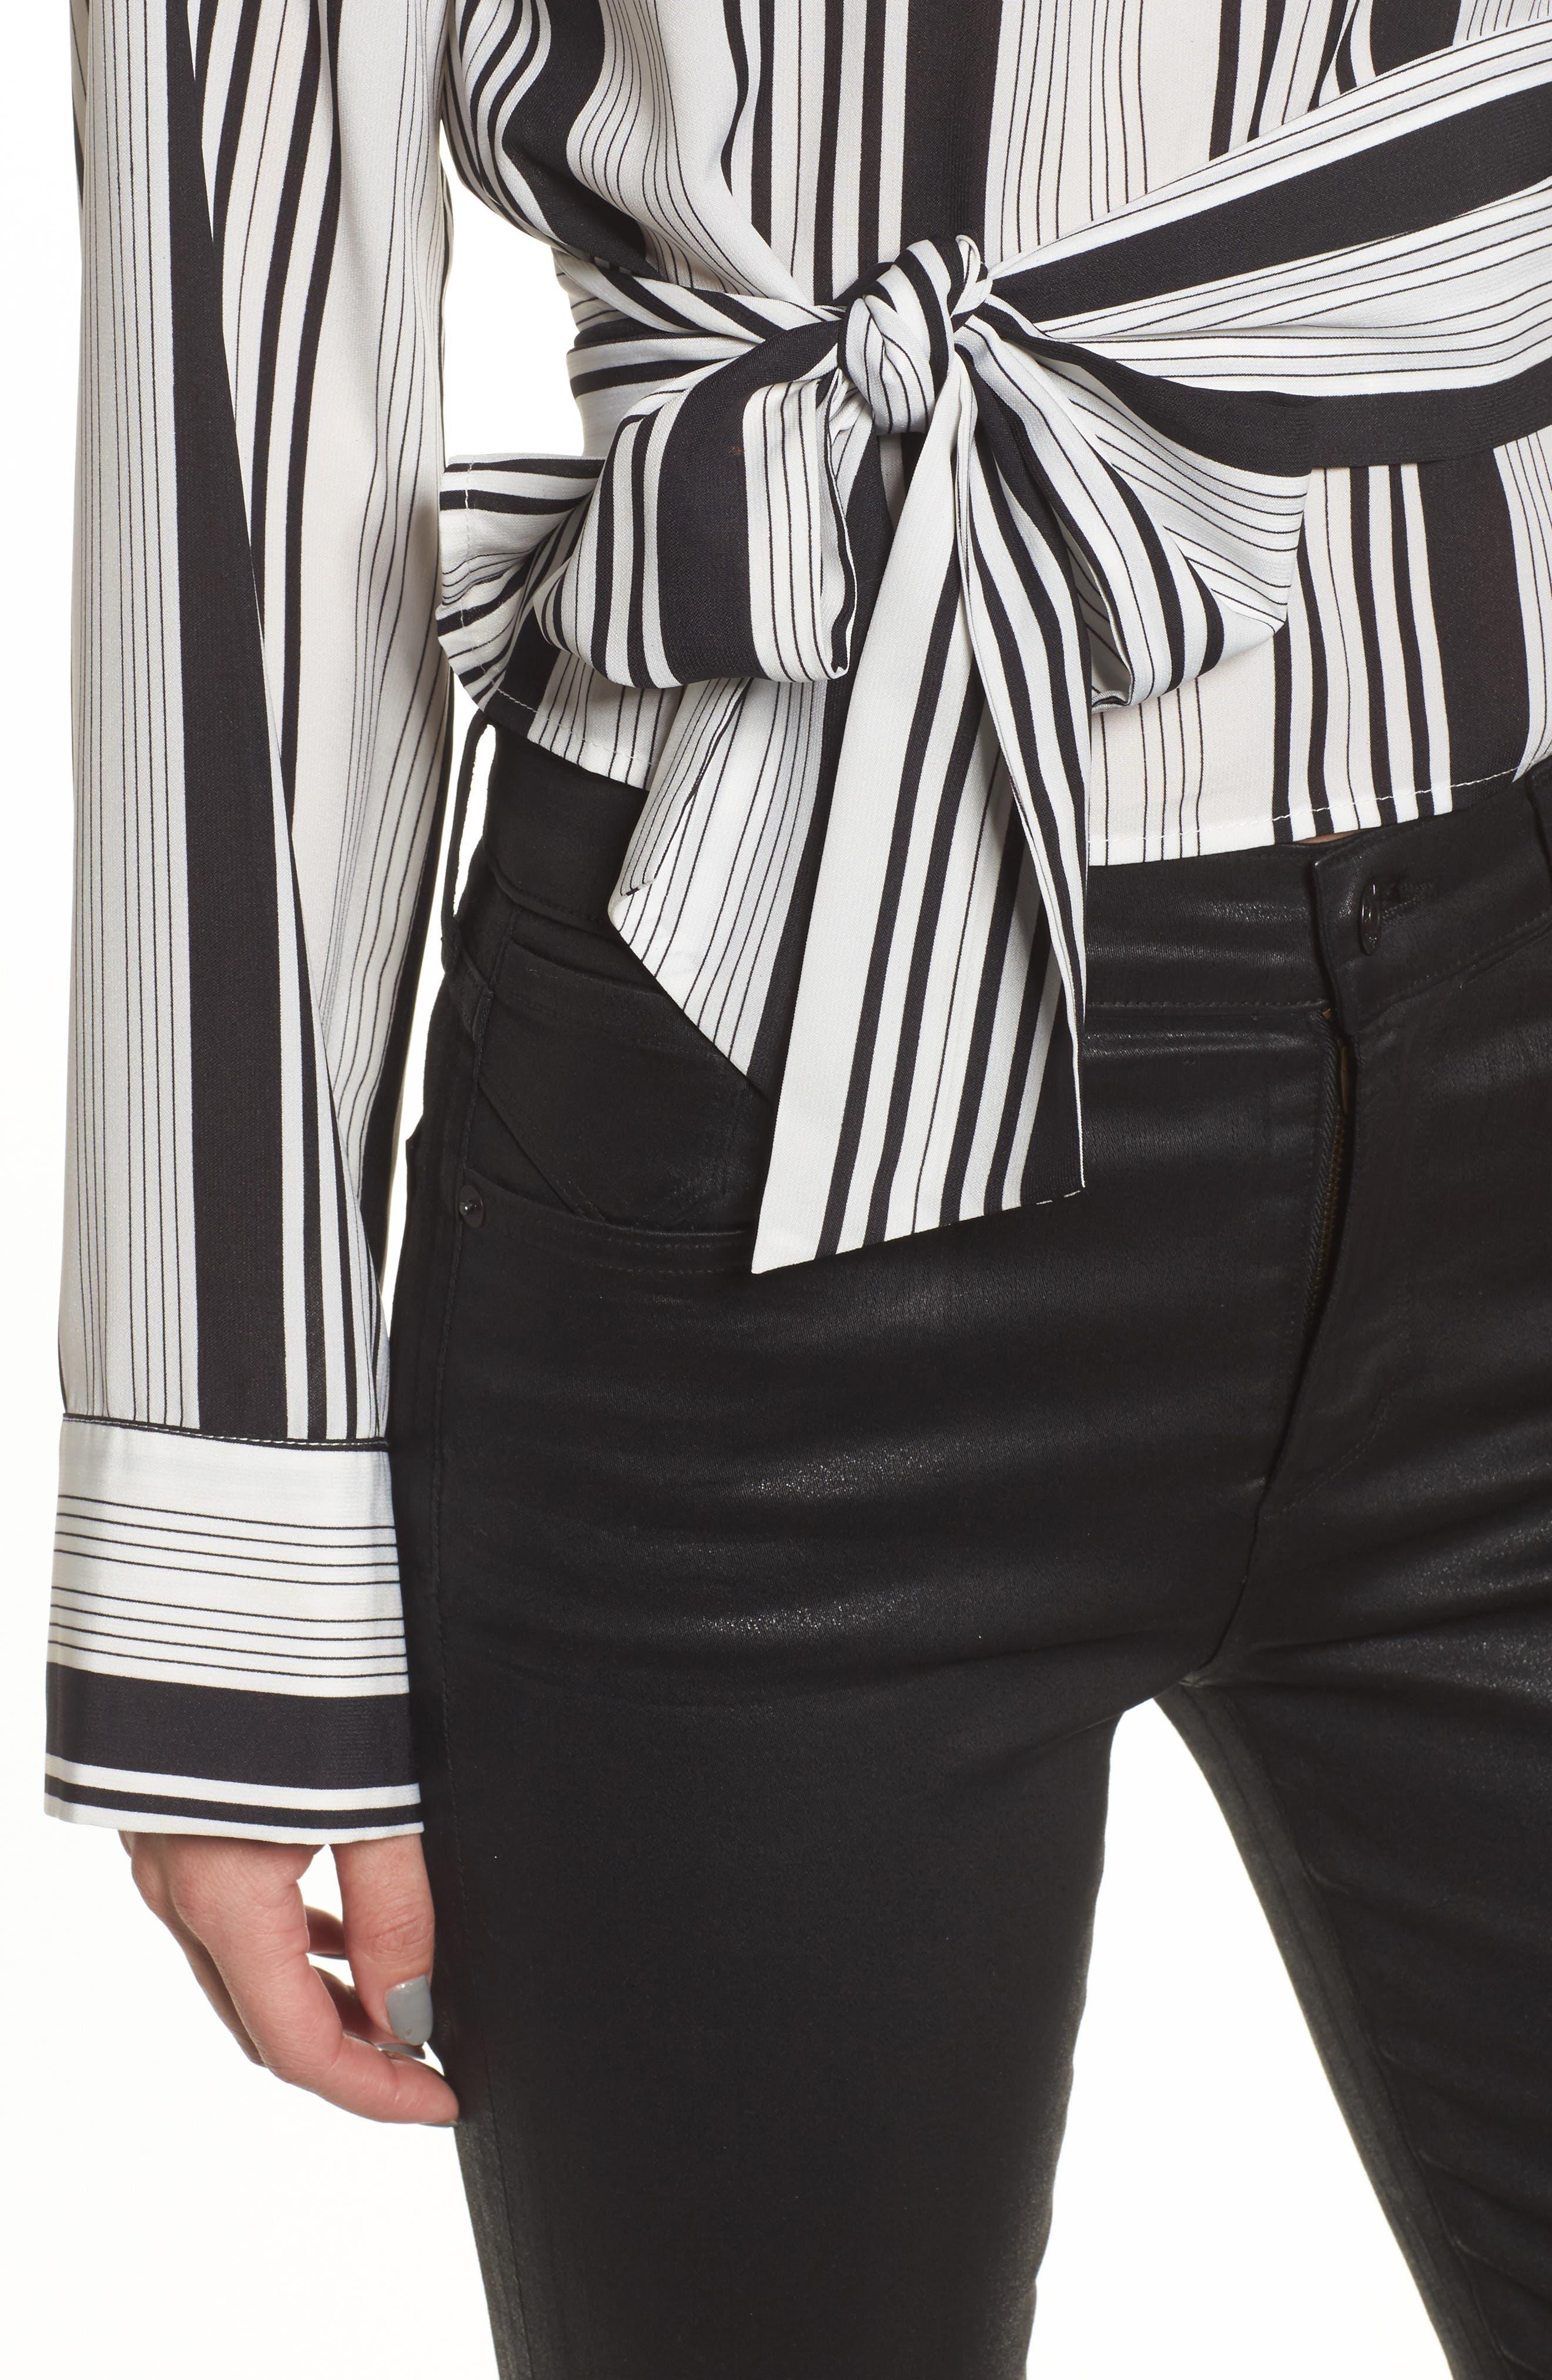 One-Shoulder Tie Waist Shirt,                             Alternate thumbnail 4, color,                             Black/ White Stripe